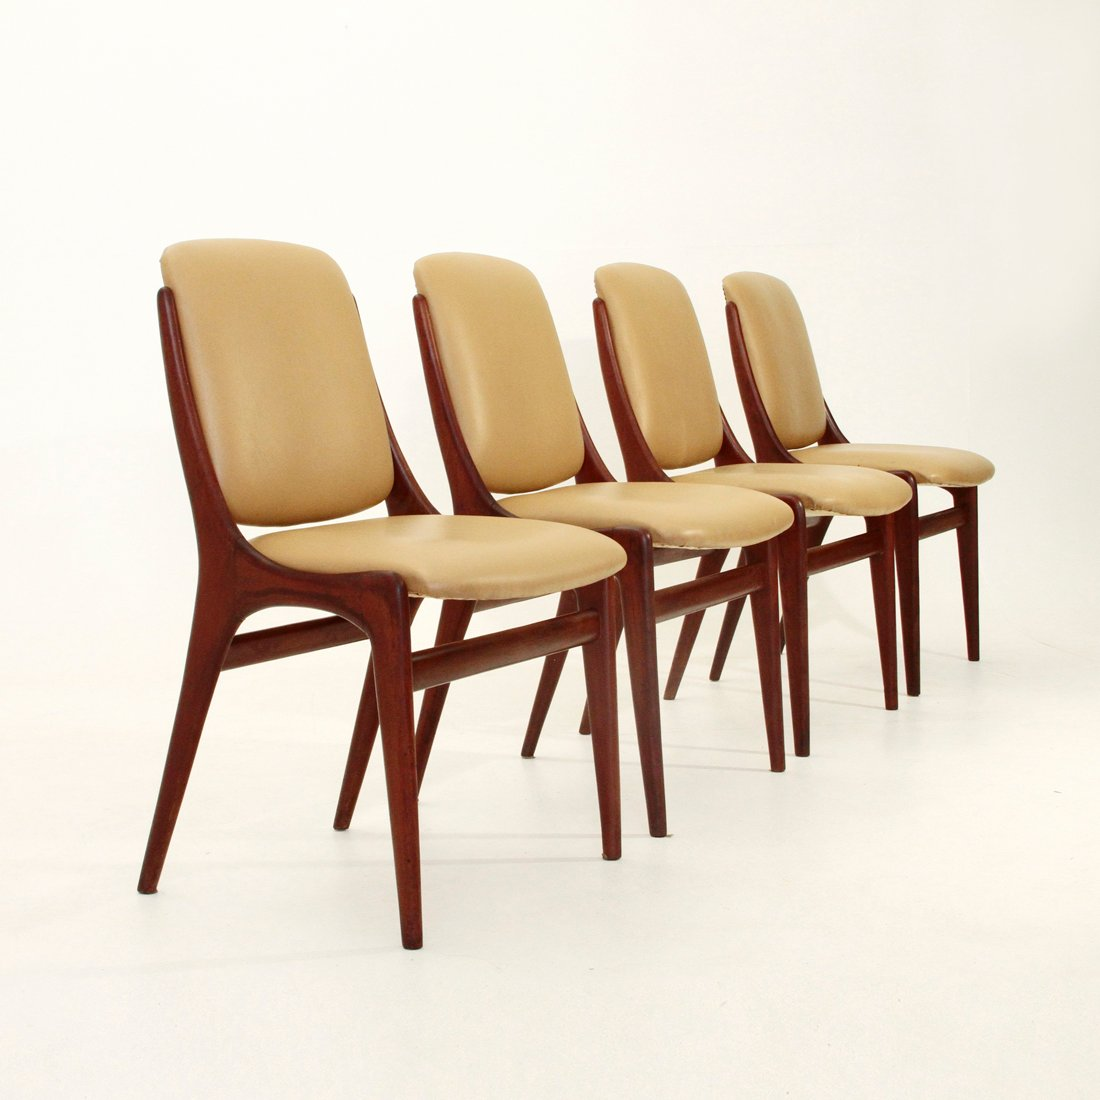 italienische mid century esszimmerst hle 1960er 4er set. Black Bedroom Furniture Sets. Home Design Ideas